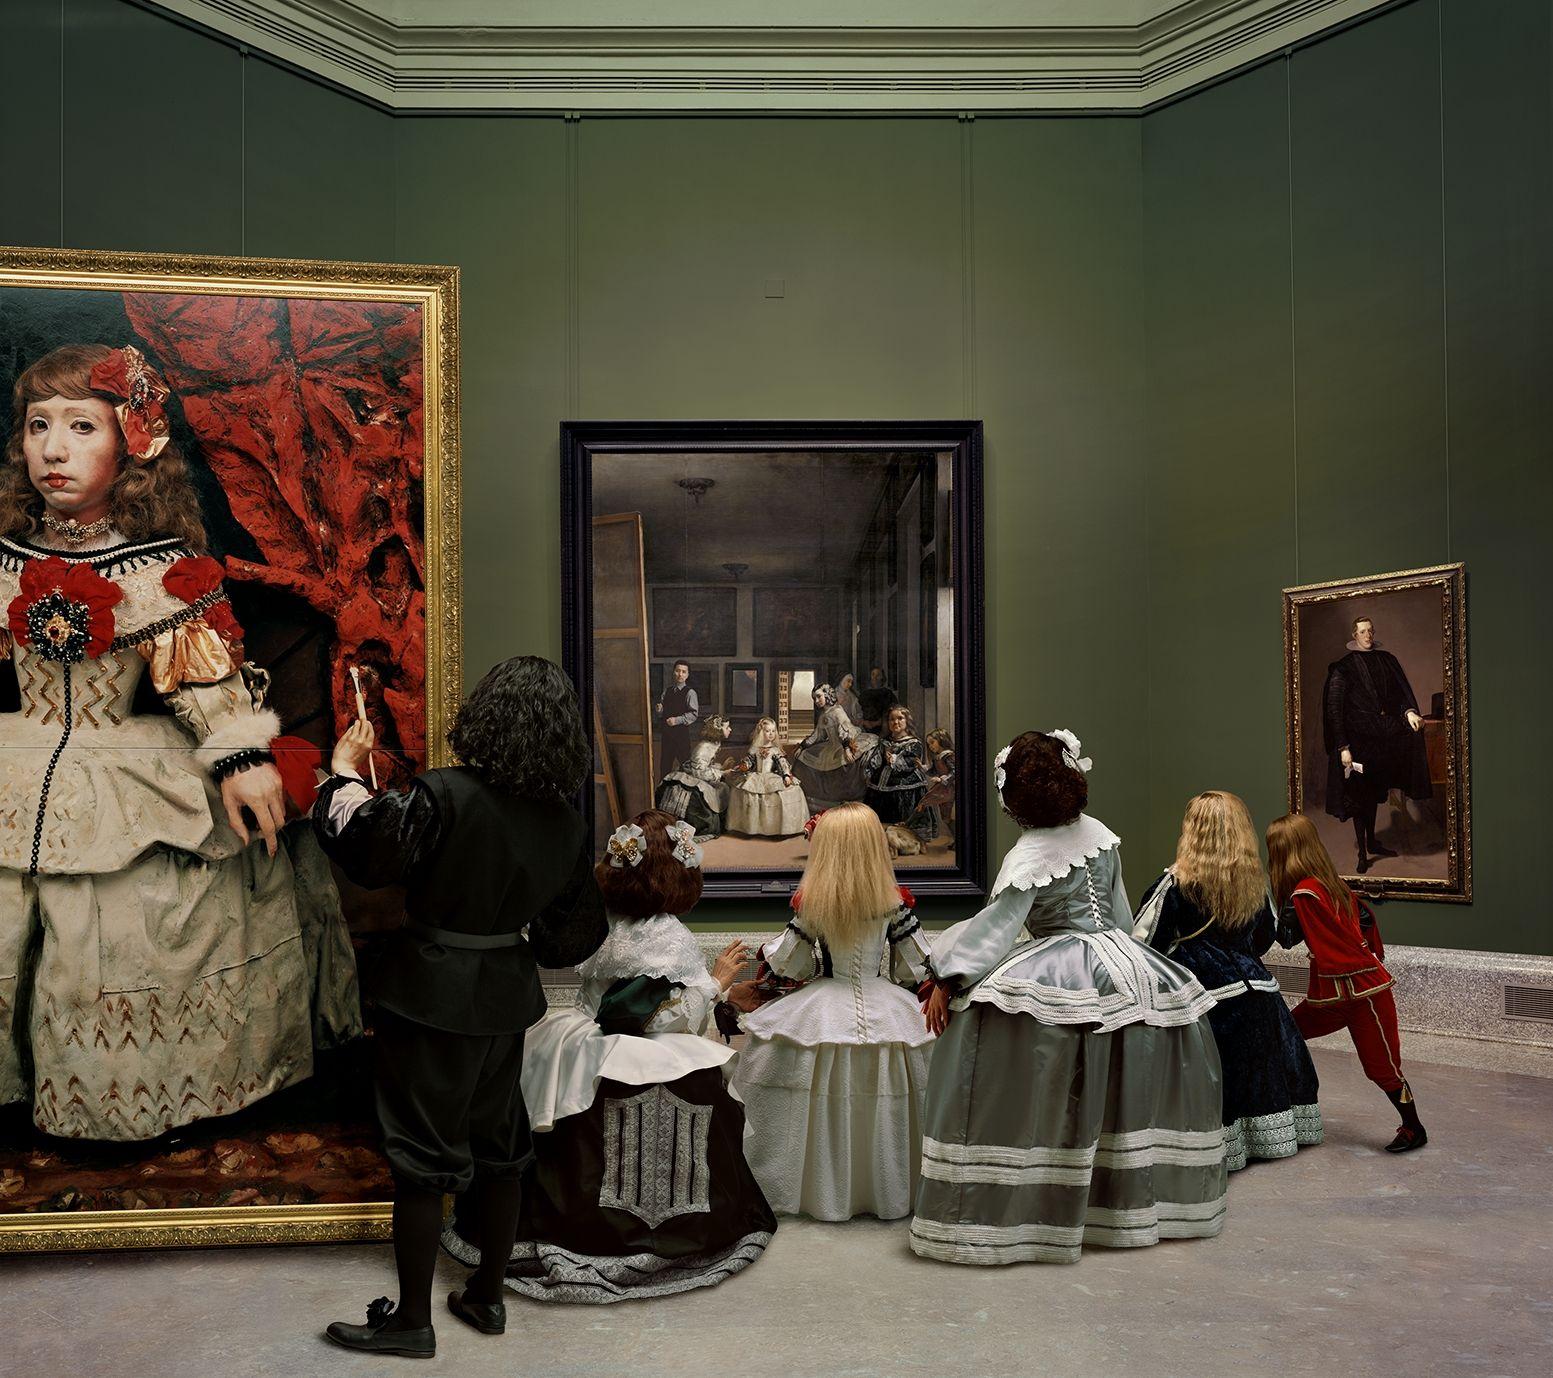 Galería - Galería Juana de Aizpuru | Appropriation art, Night art, Art